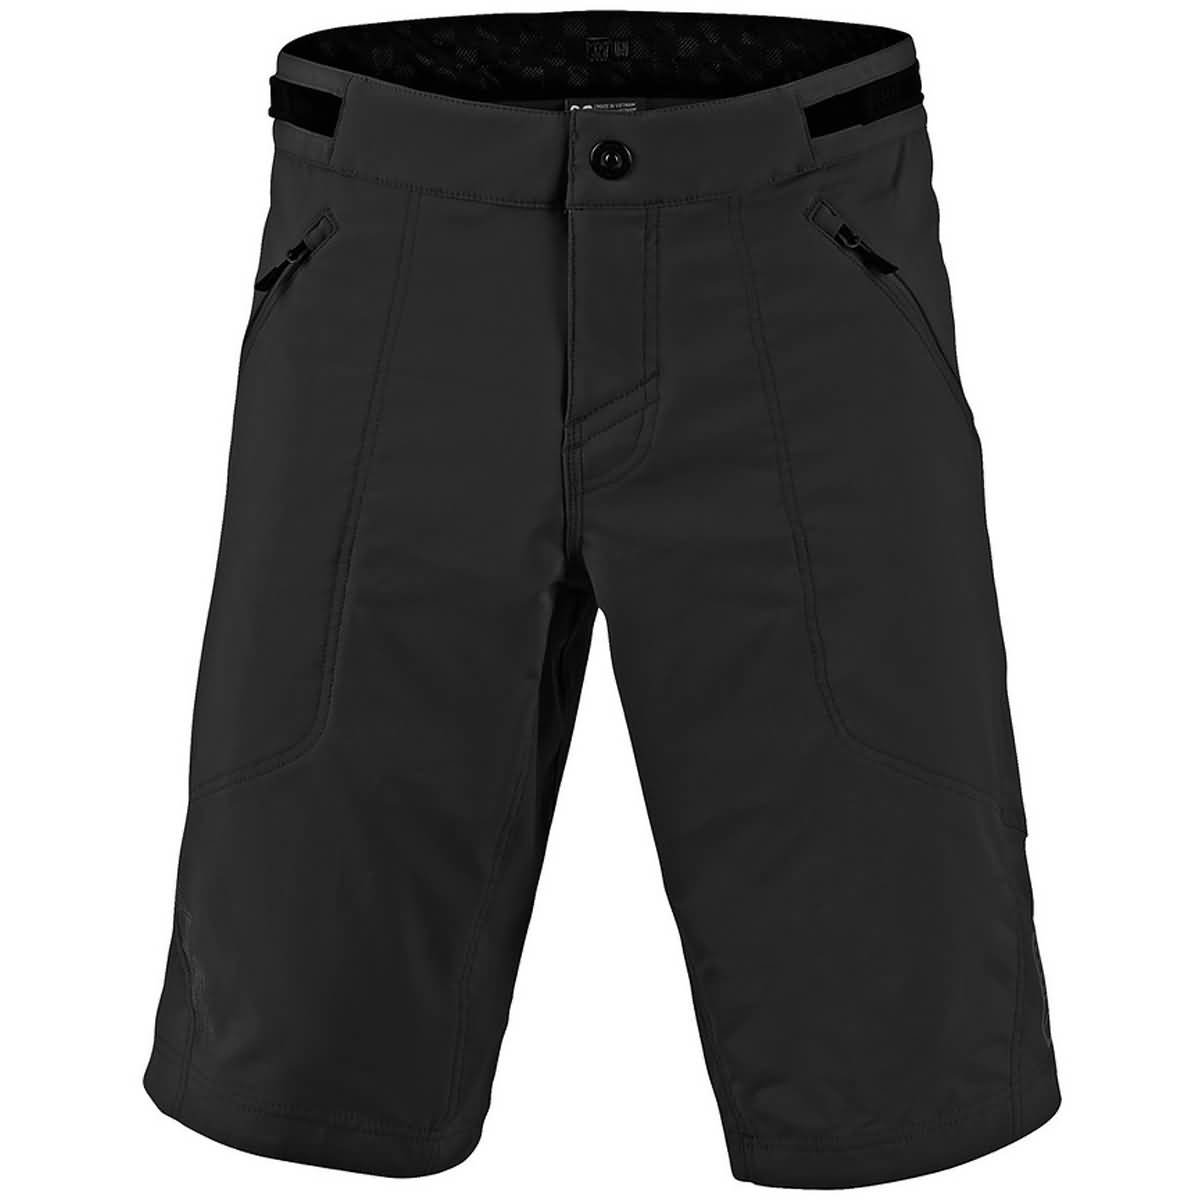 Troy Lee Designs Skyline Short - Boys' Solid Black, 26 by Troy Lee Designs